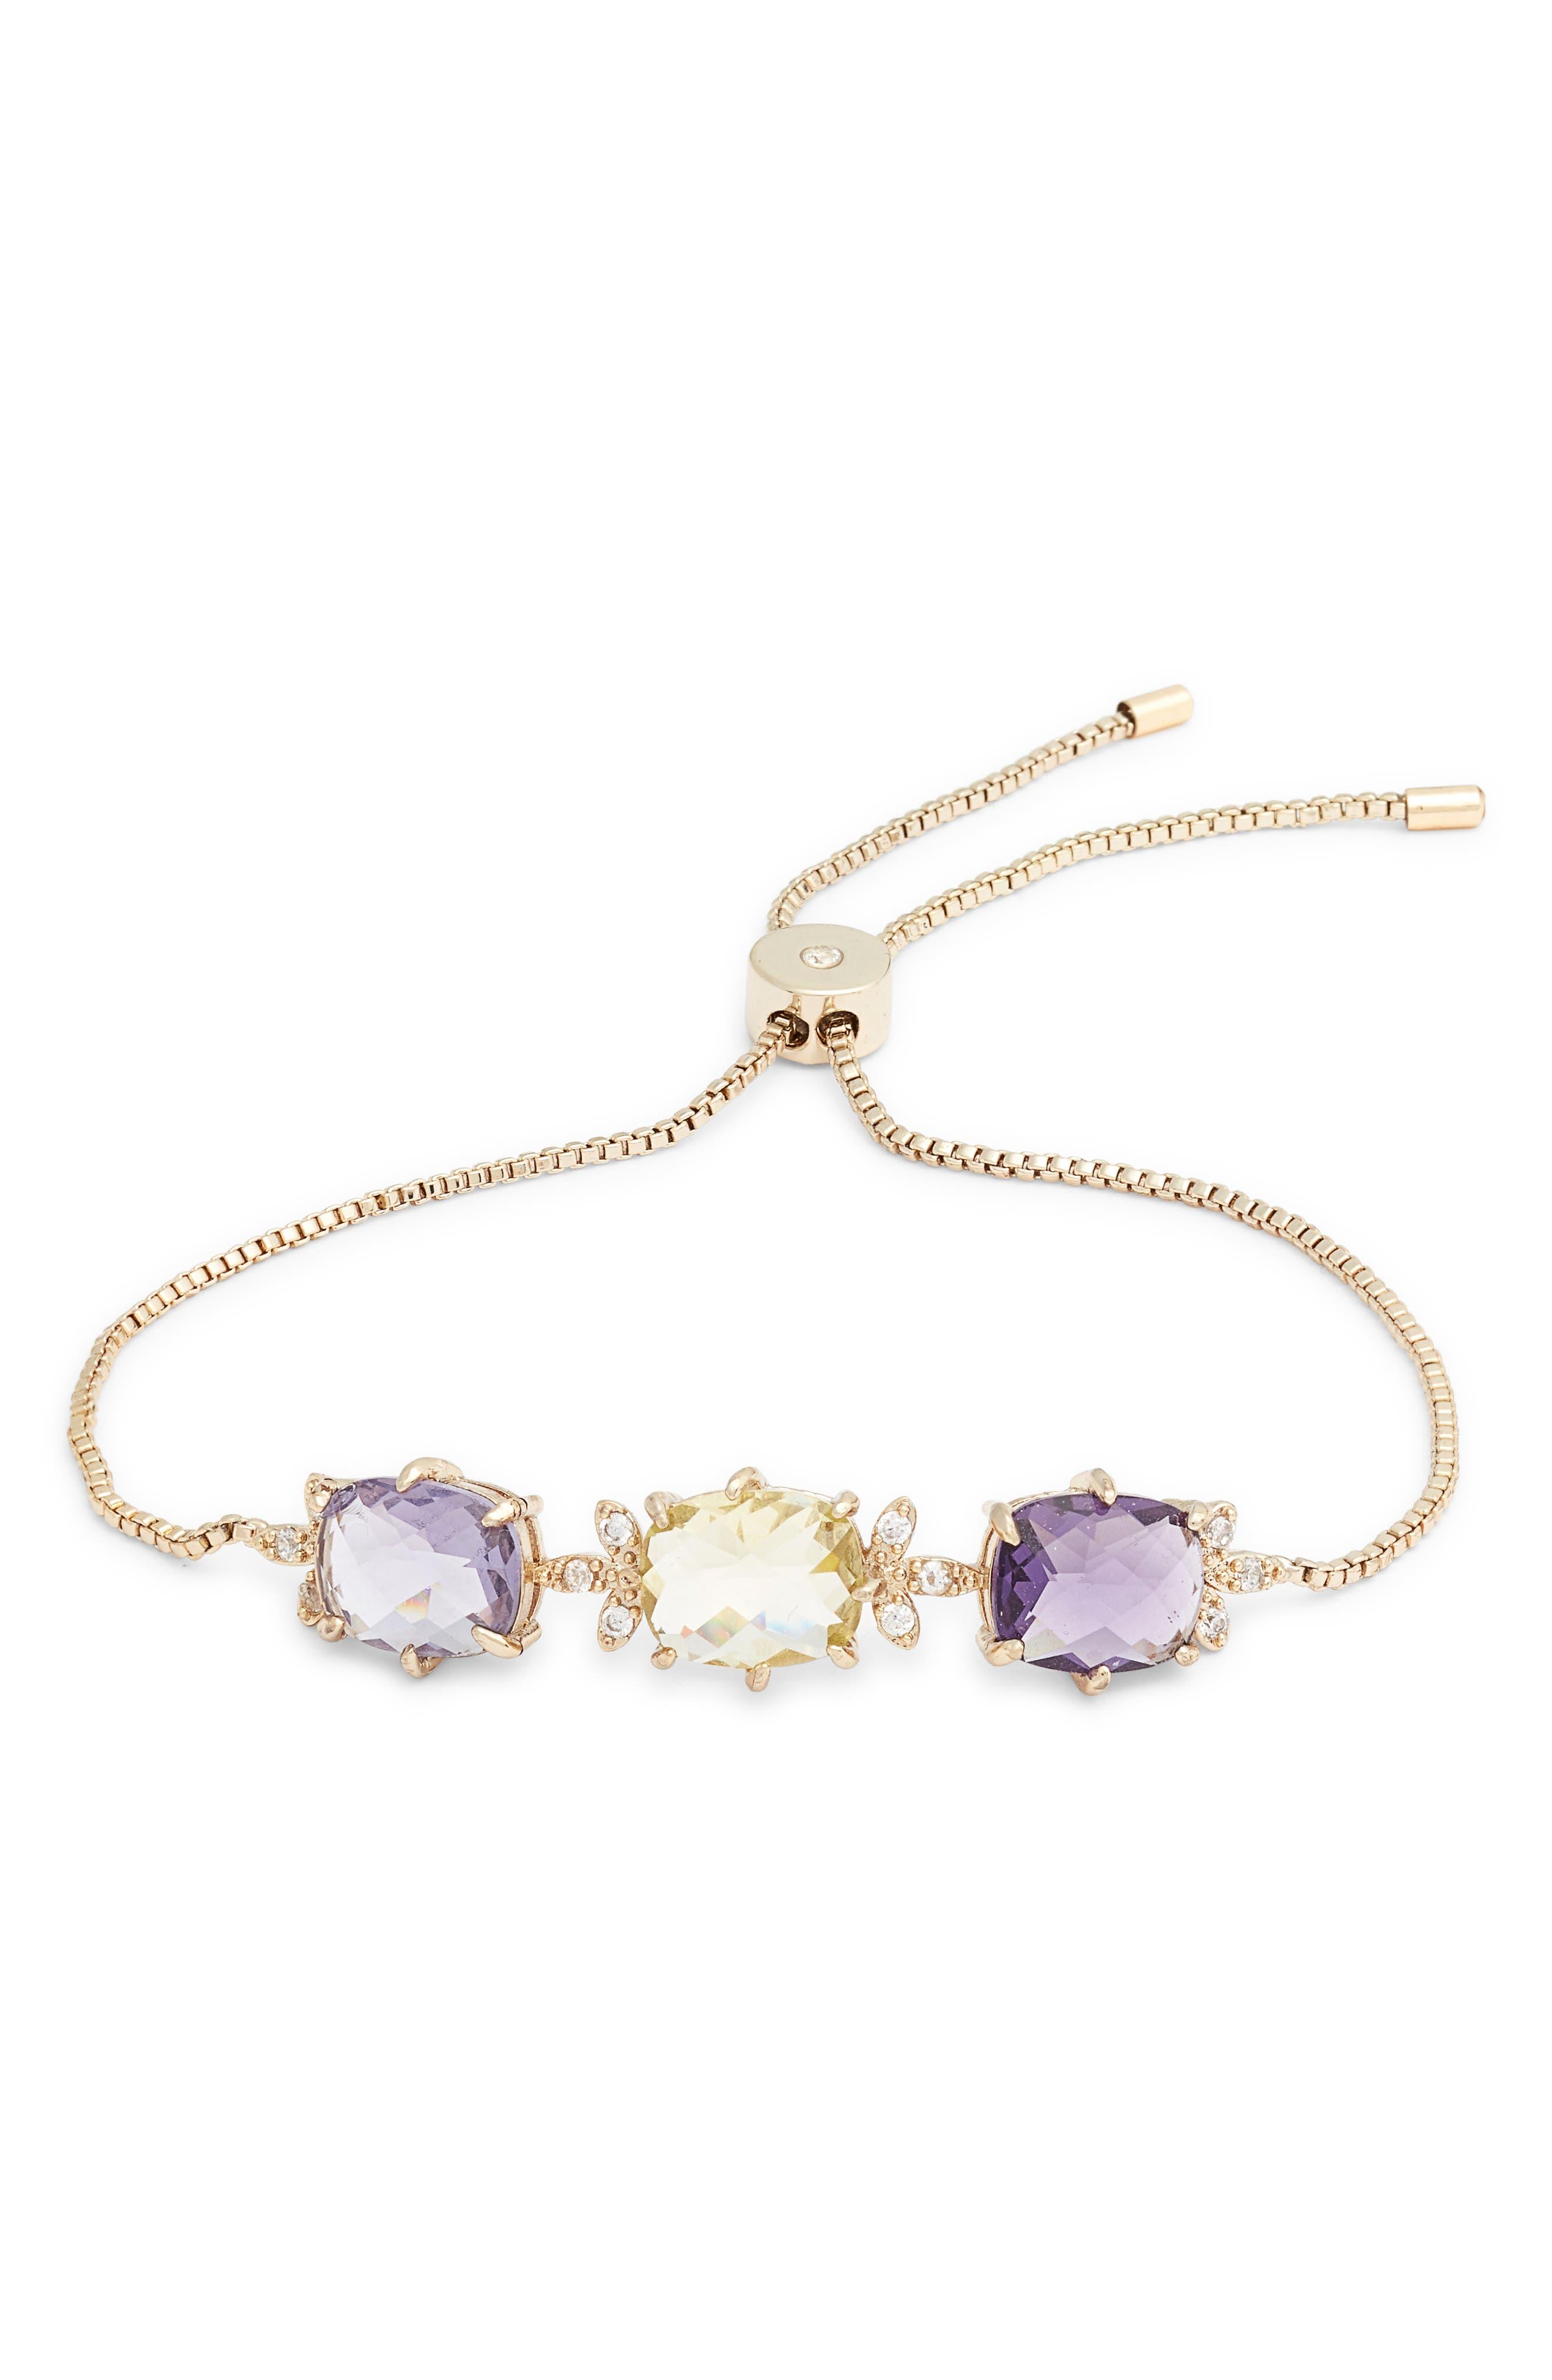 JENNY PACKHAM, Stone Slider Bracelet, Main thumbnail 1, color, 500